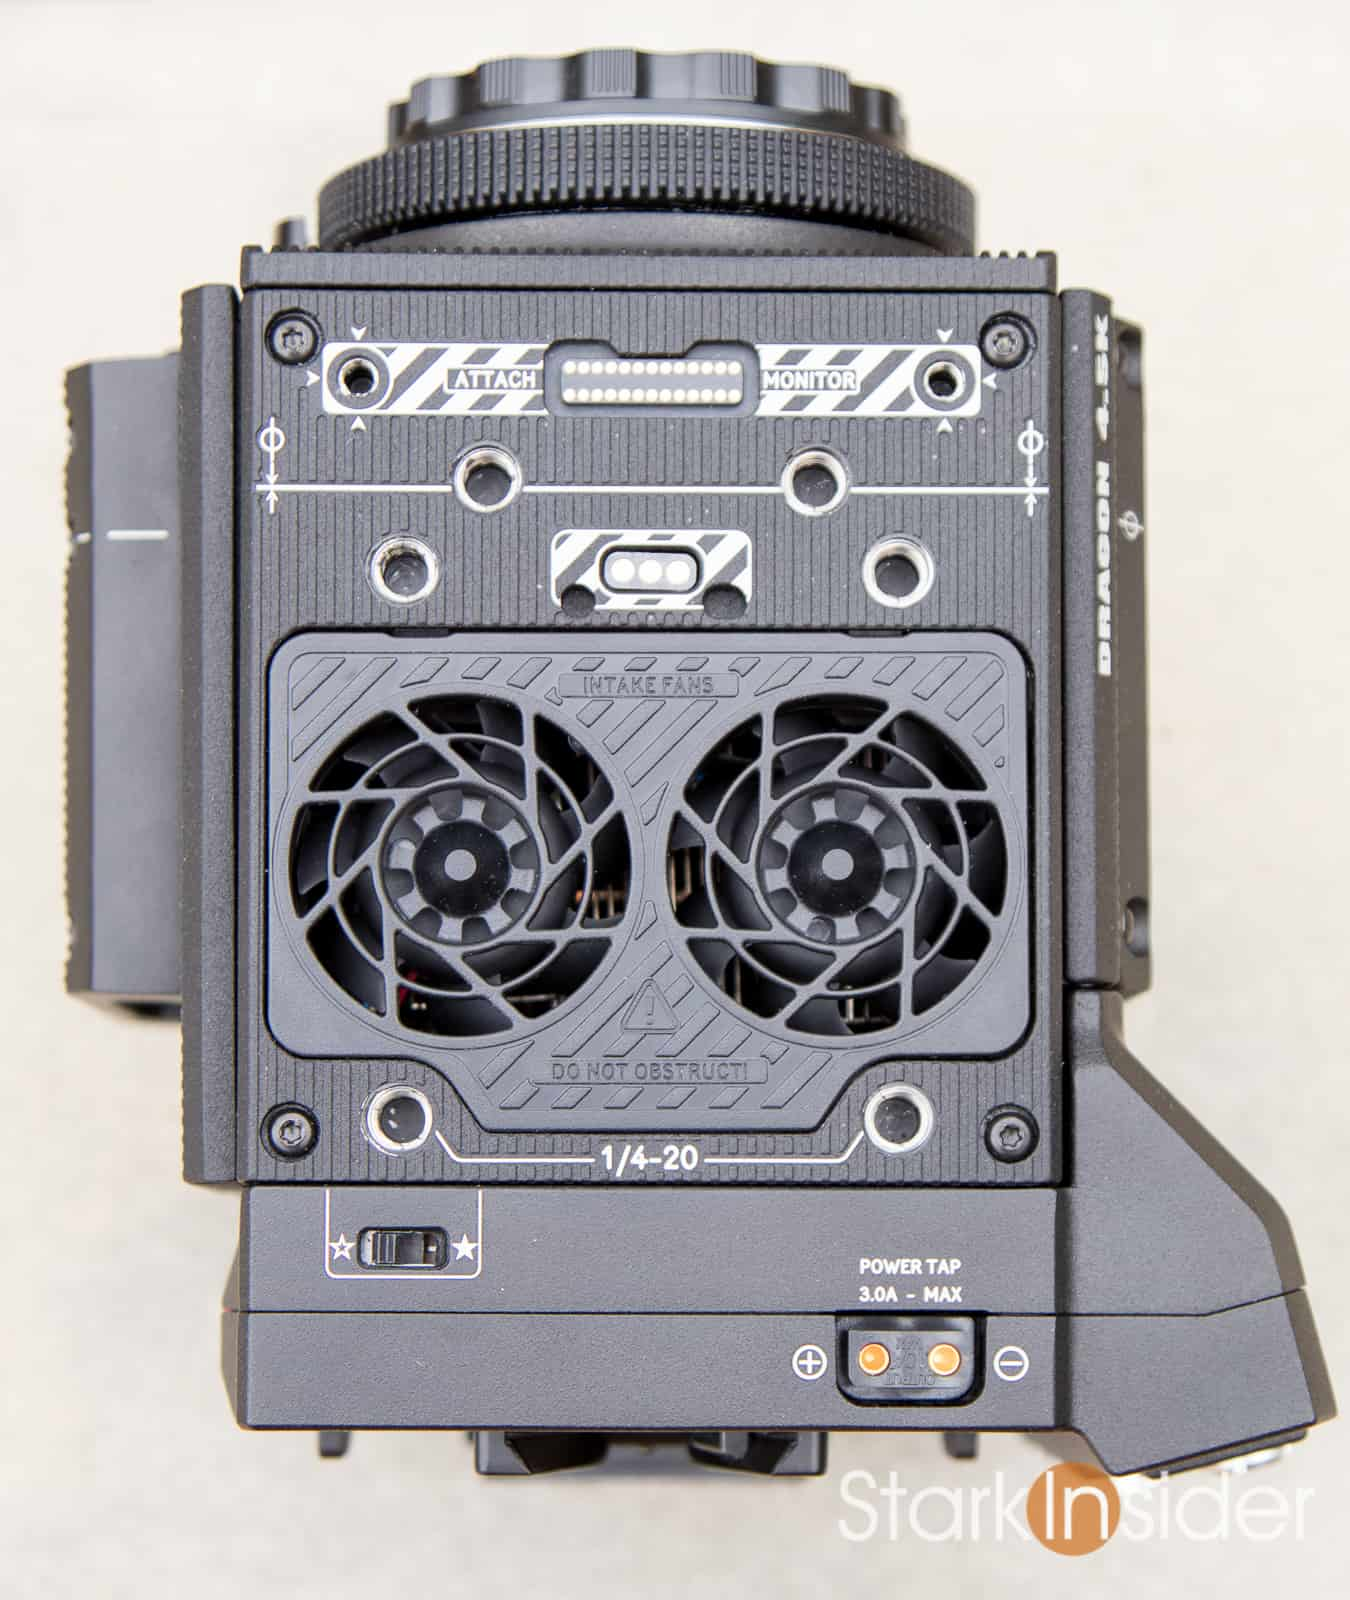 RED-Raven-Camera-Unboxing-Stark-Insider-8730